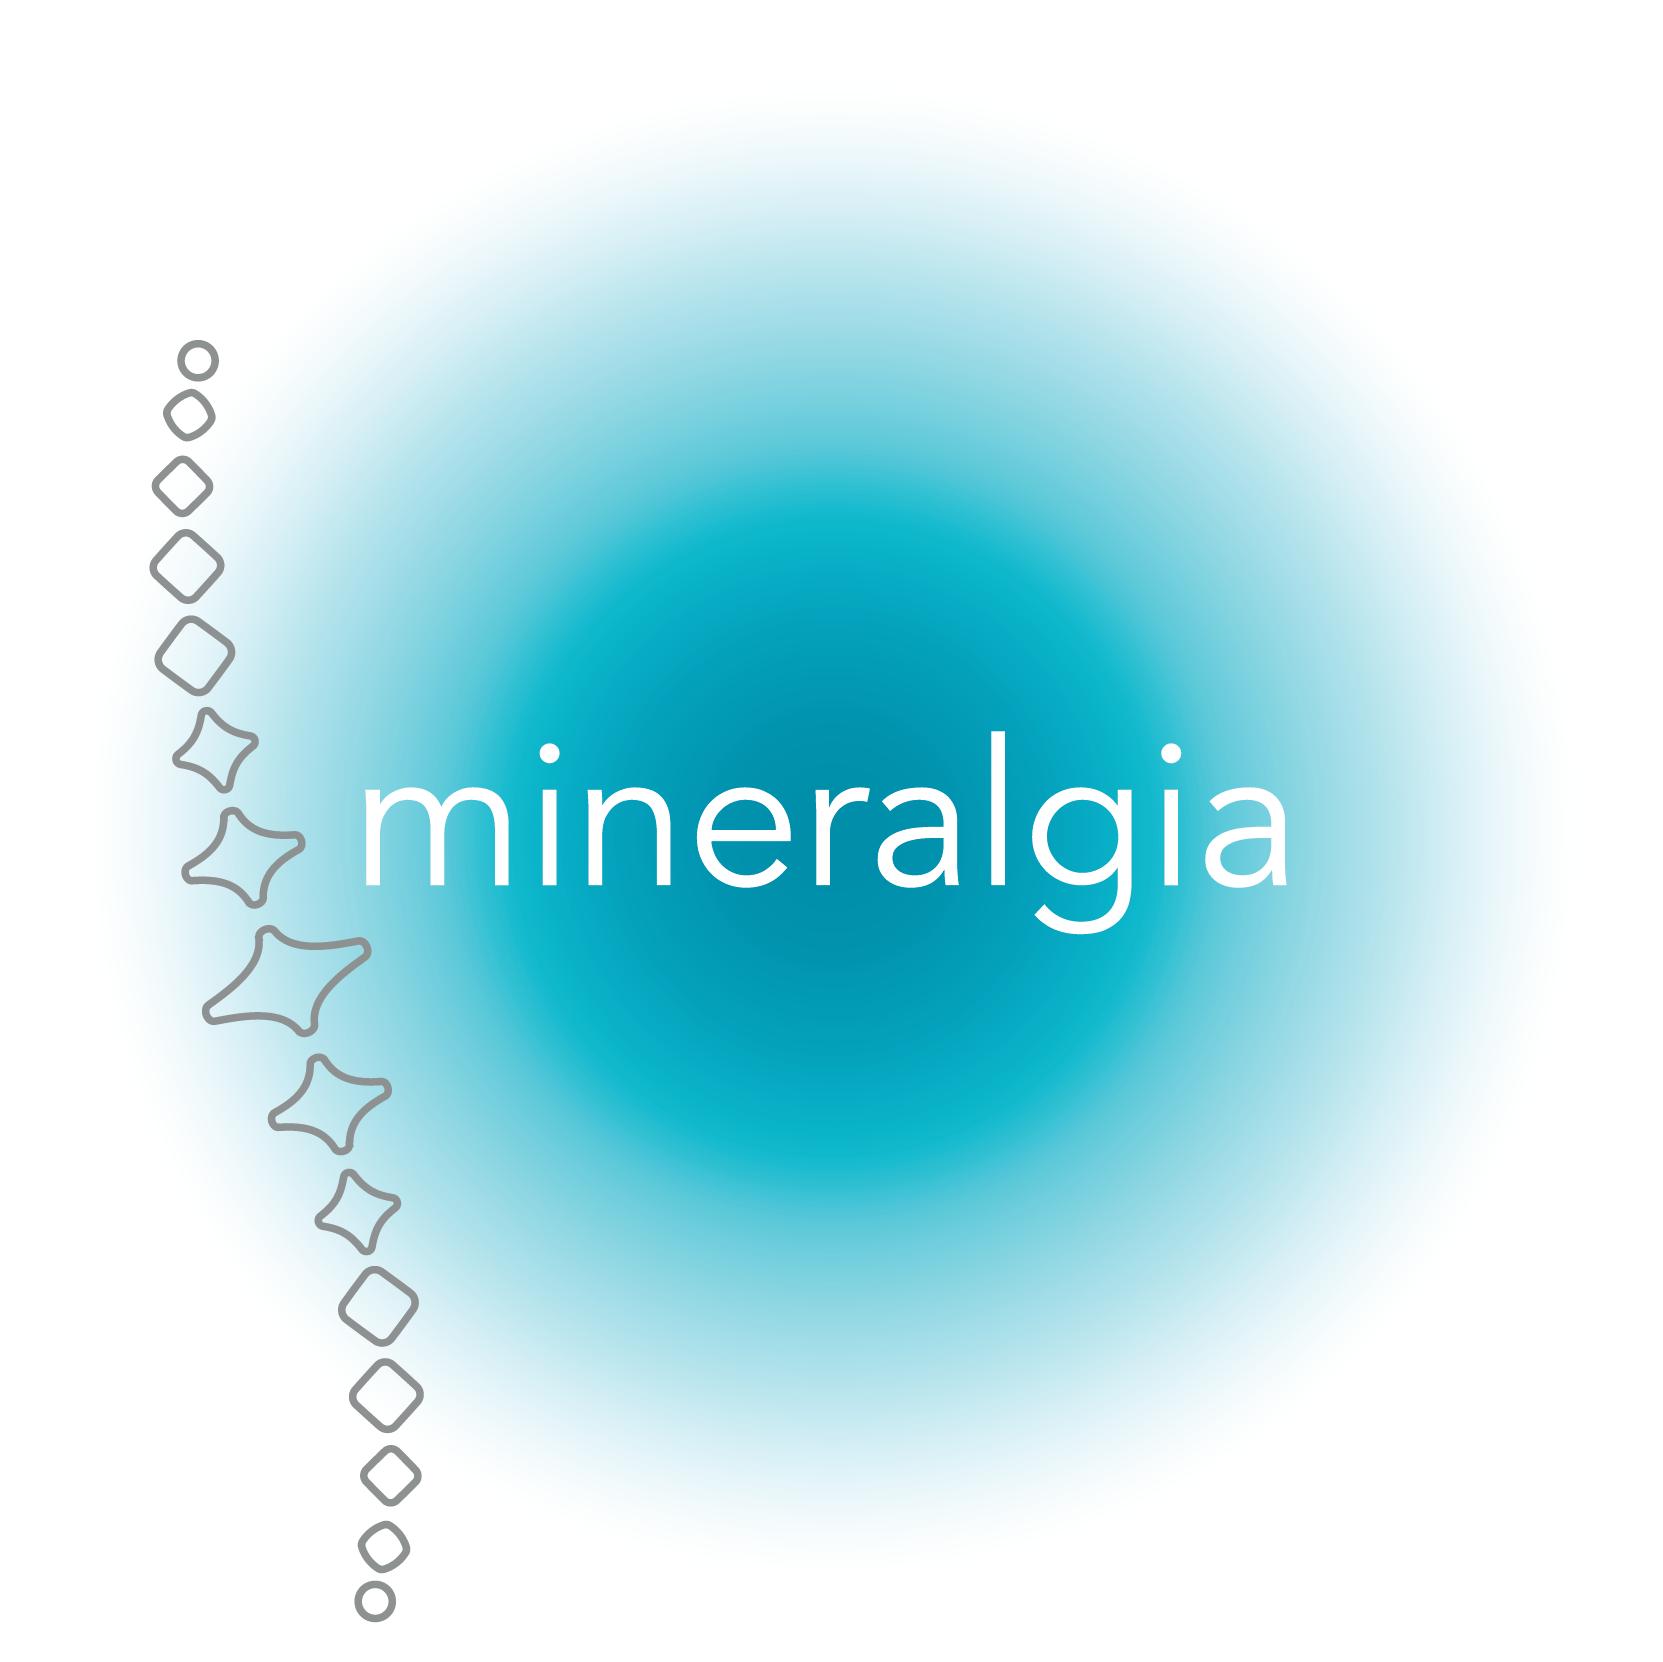 Mineralgia_Logo_011719-01.png